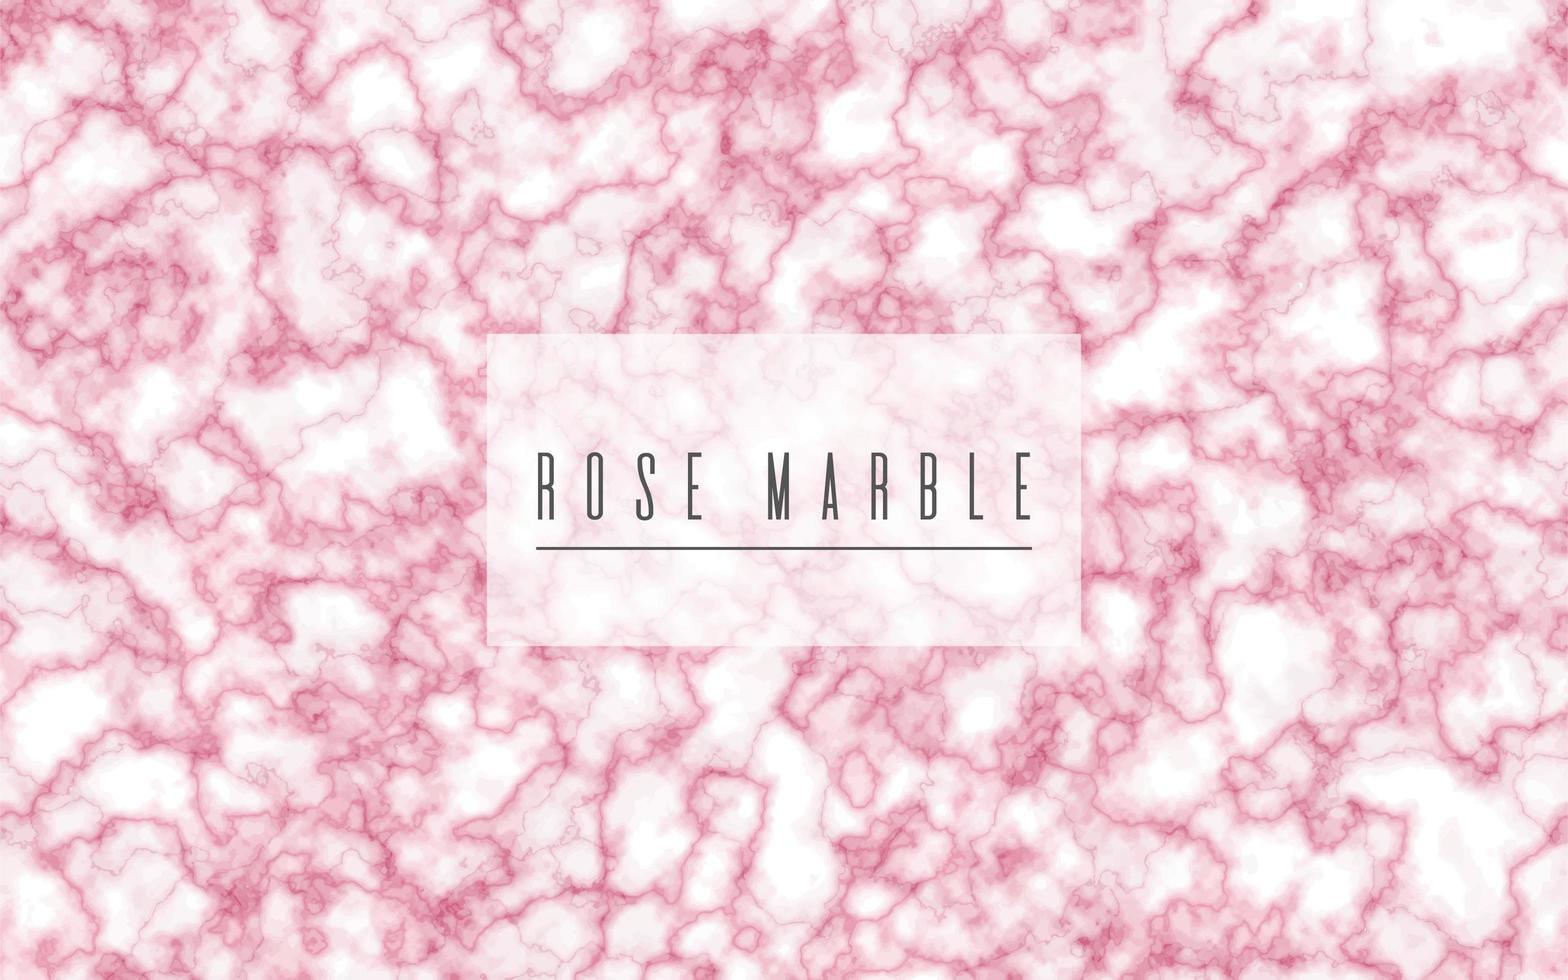 Pink Marble Effect Texture Download Free Vectors Clipart Graphics Vector Art